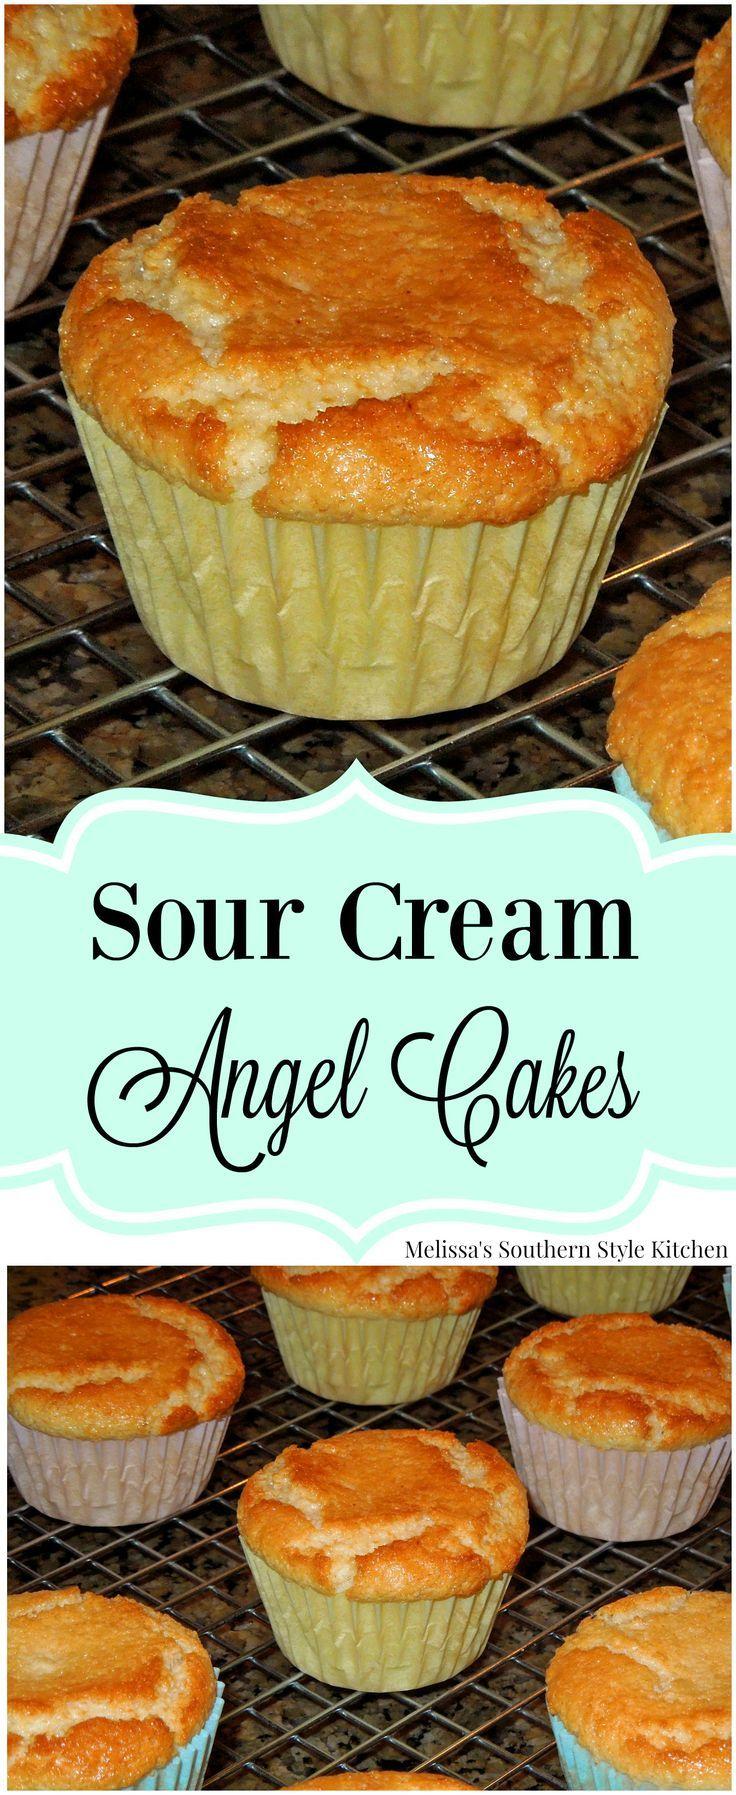 Sour Cream Angel Cakes #sourcream